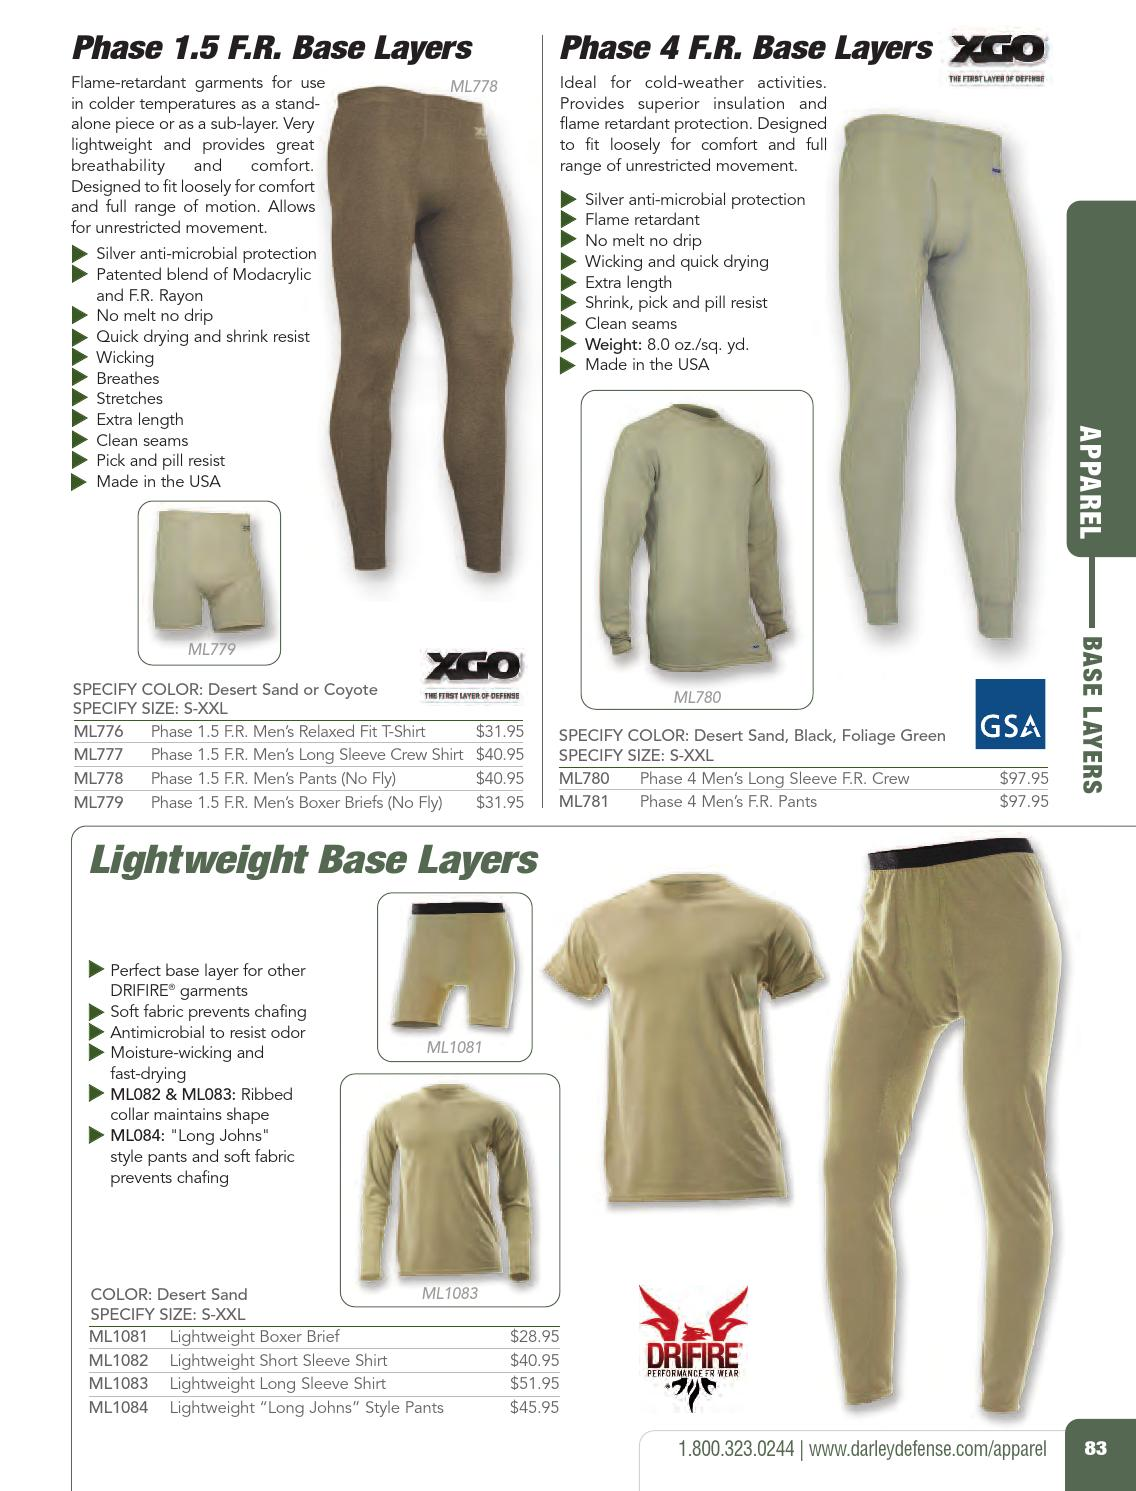 DRIFIRE Flame Resistant Military Ultra-Lightweight Long John Pant XXL